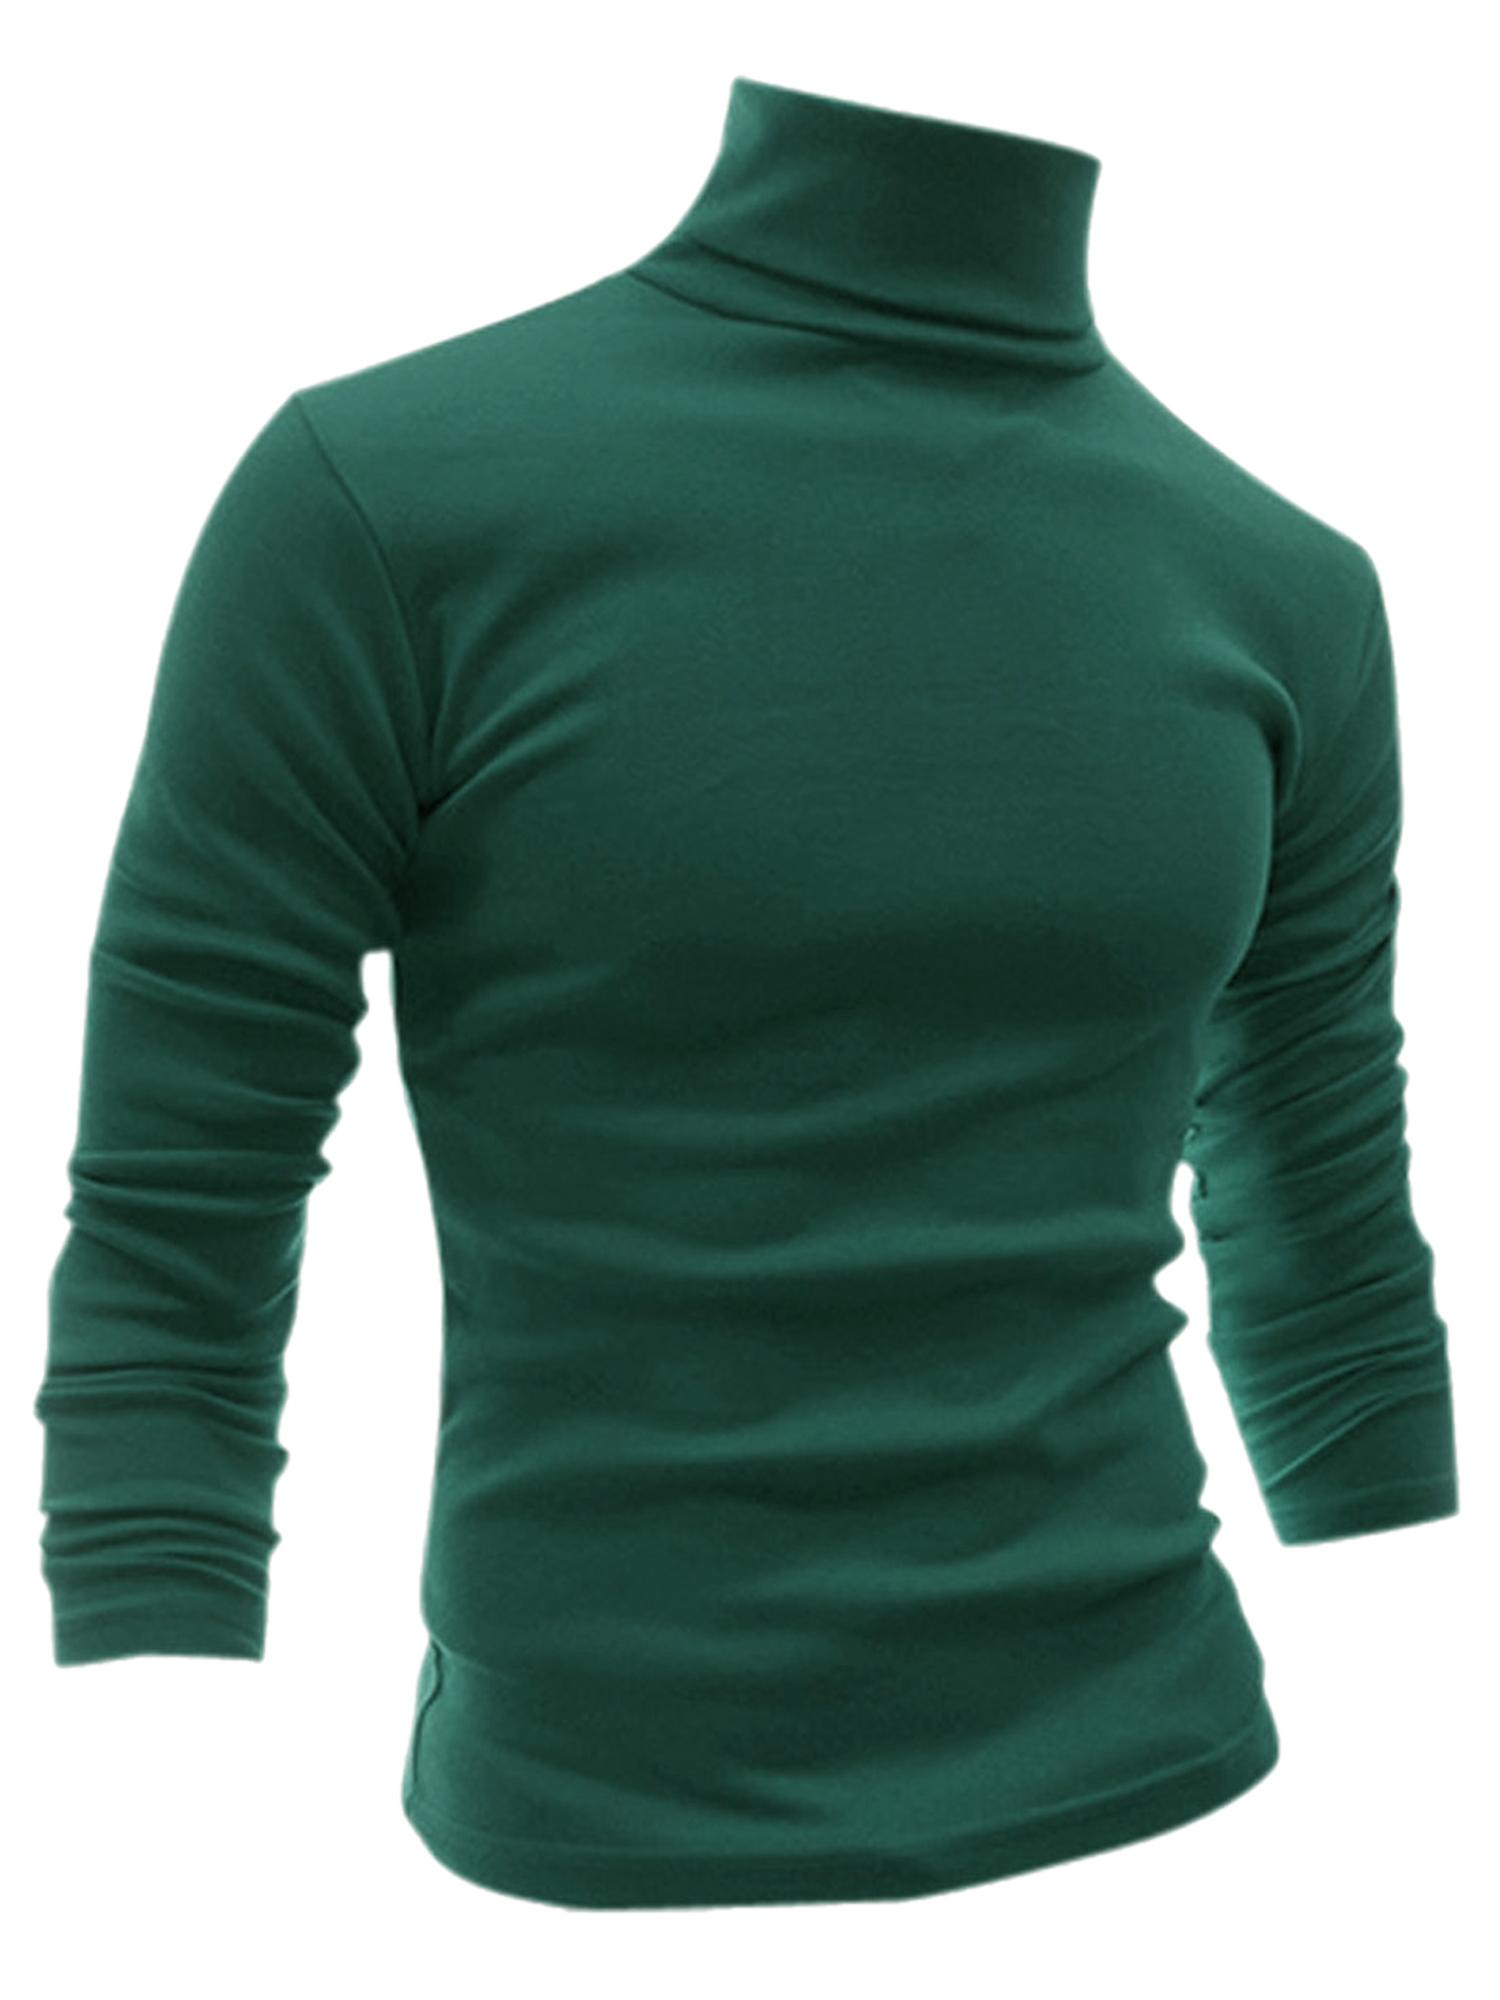 Men Turtle Neck Long Sleeves Stretchy Shirt Dark Green XXL US 50